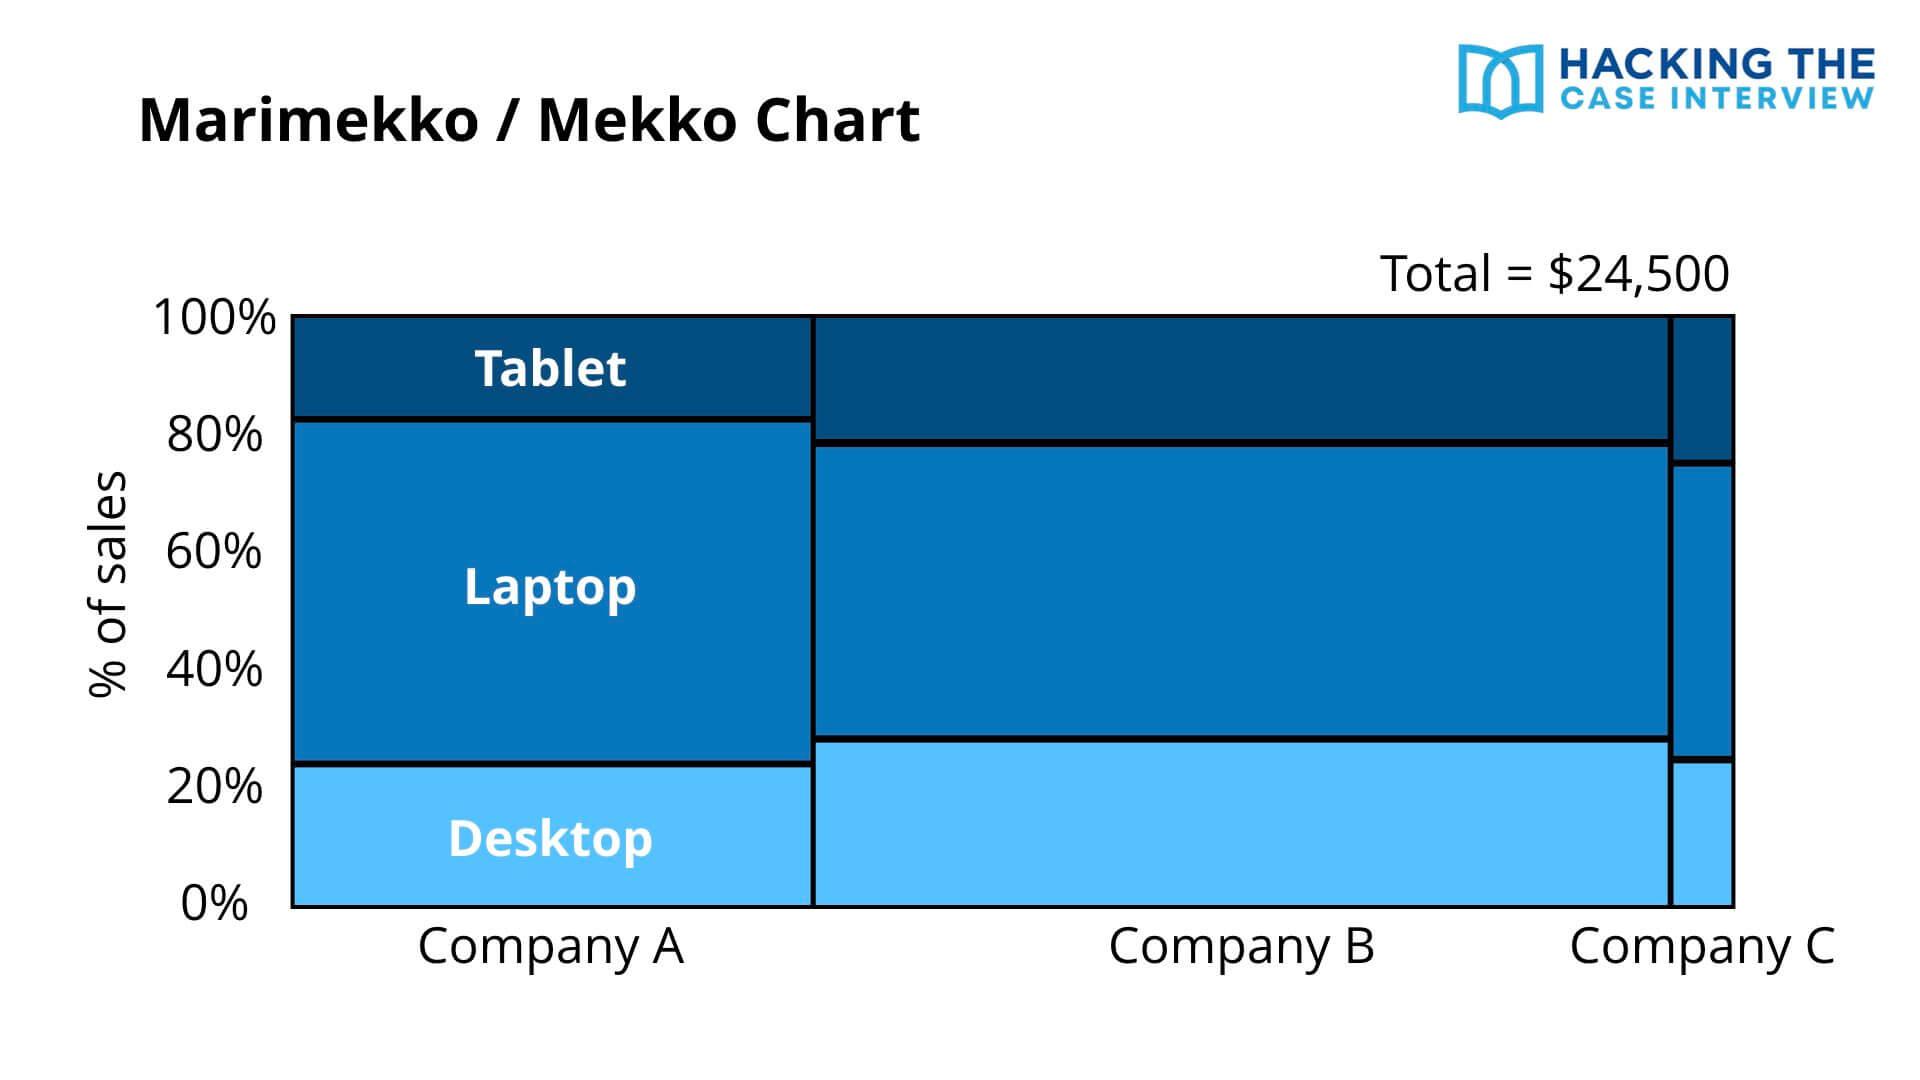 Case Interview Marimekko Mekko Chart